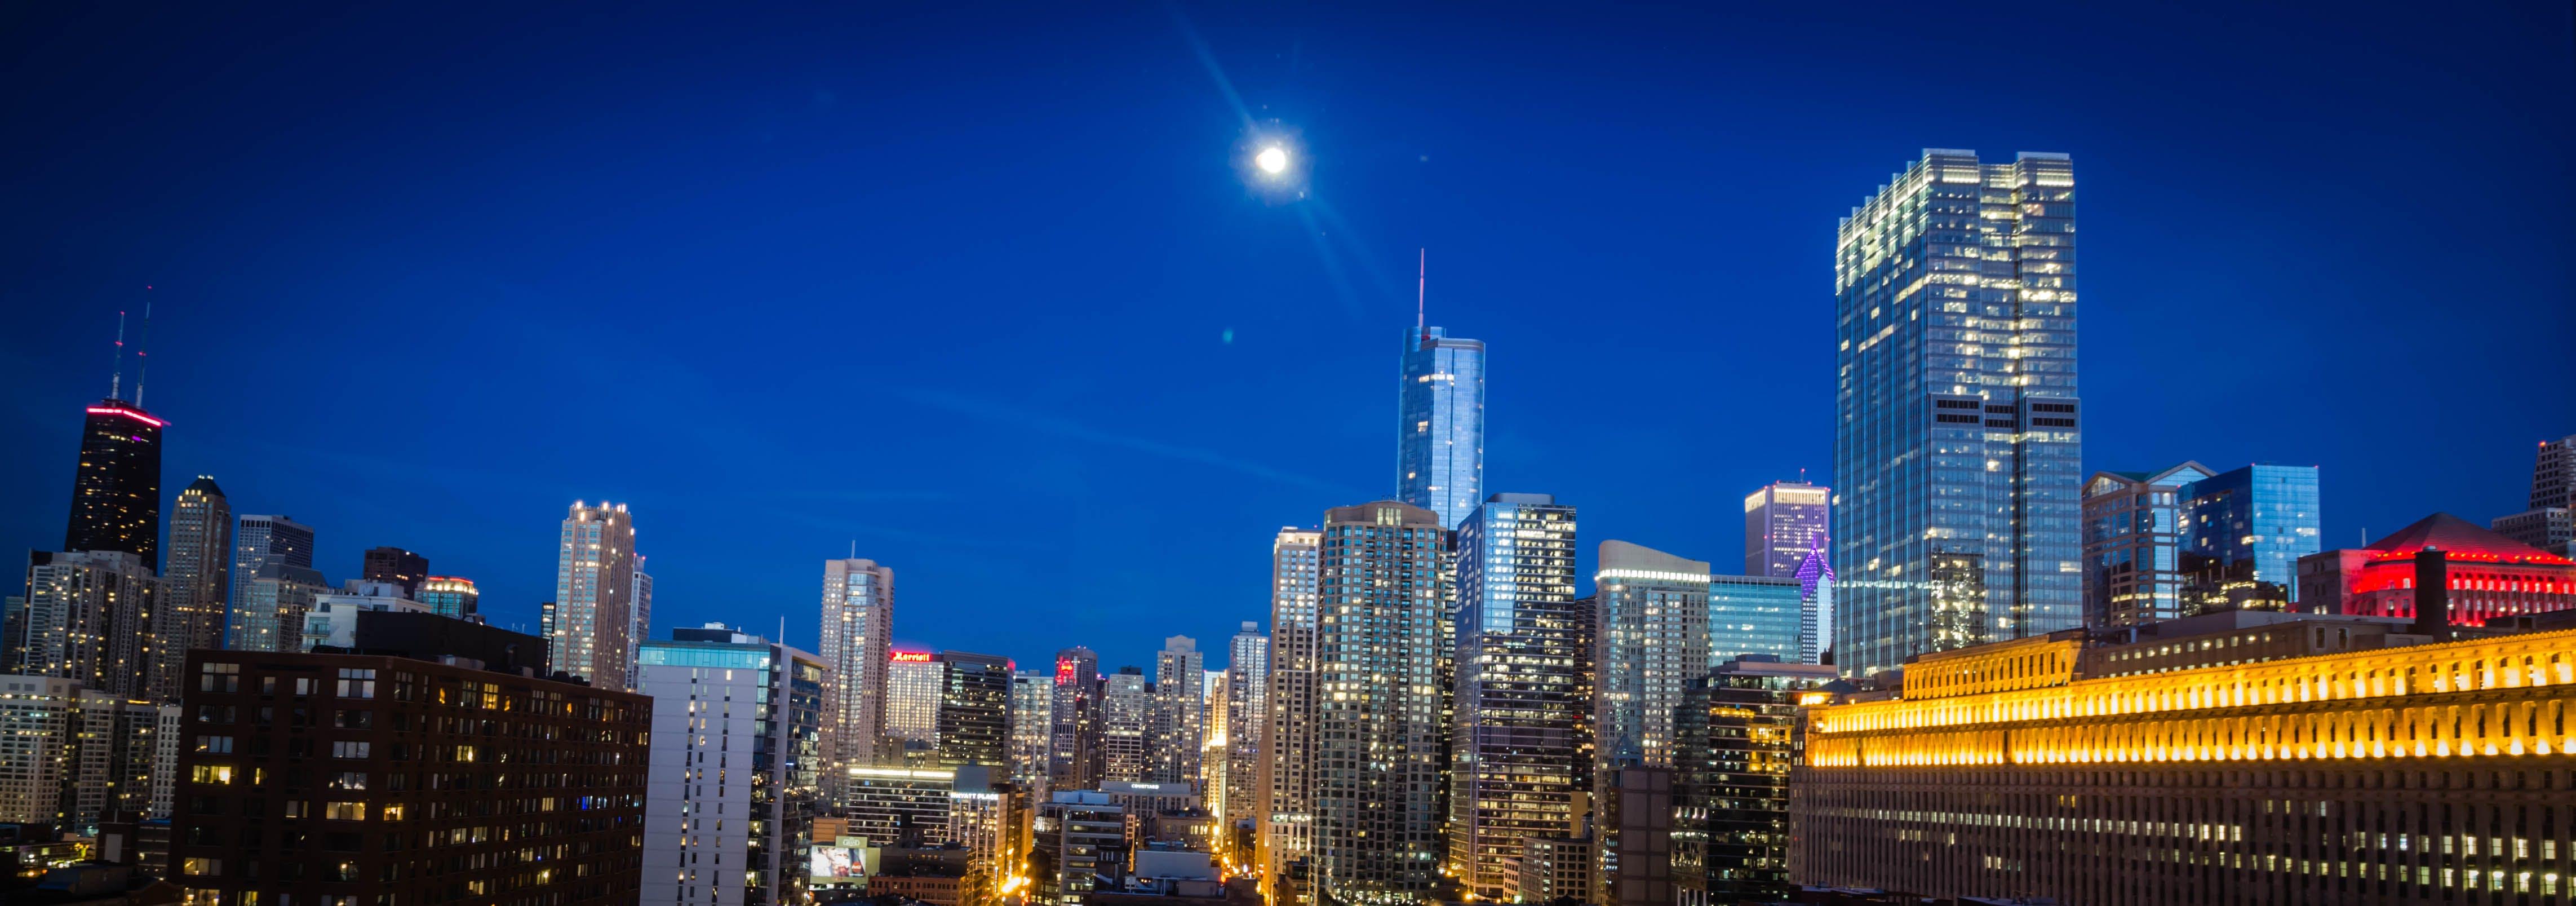 Free stock photo of city, night, moonlight, cityscape